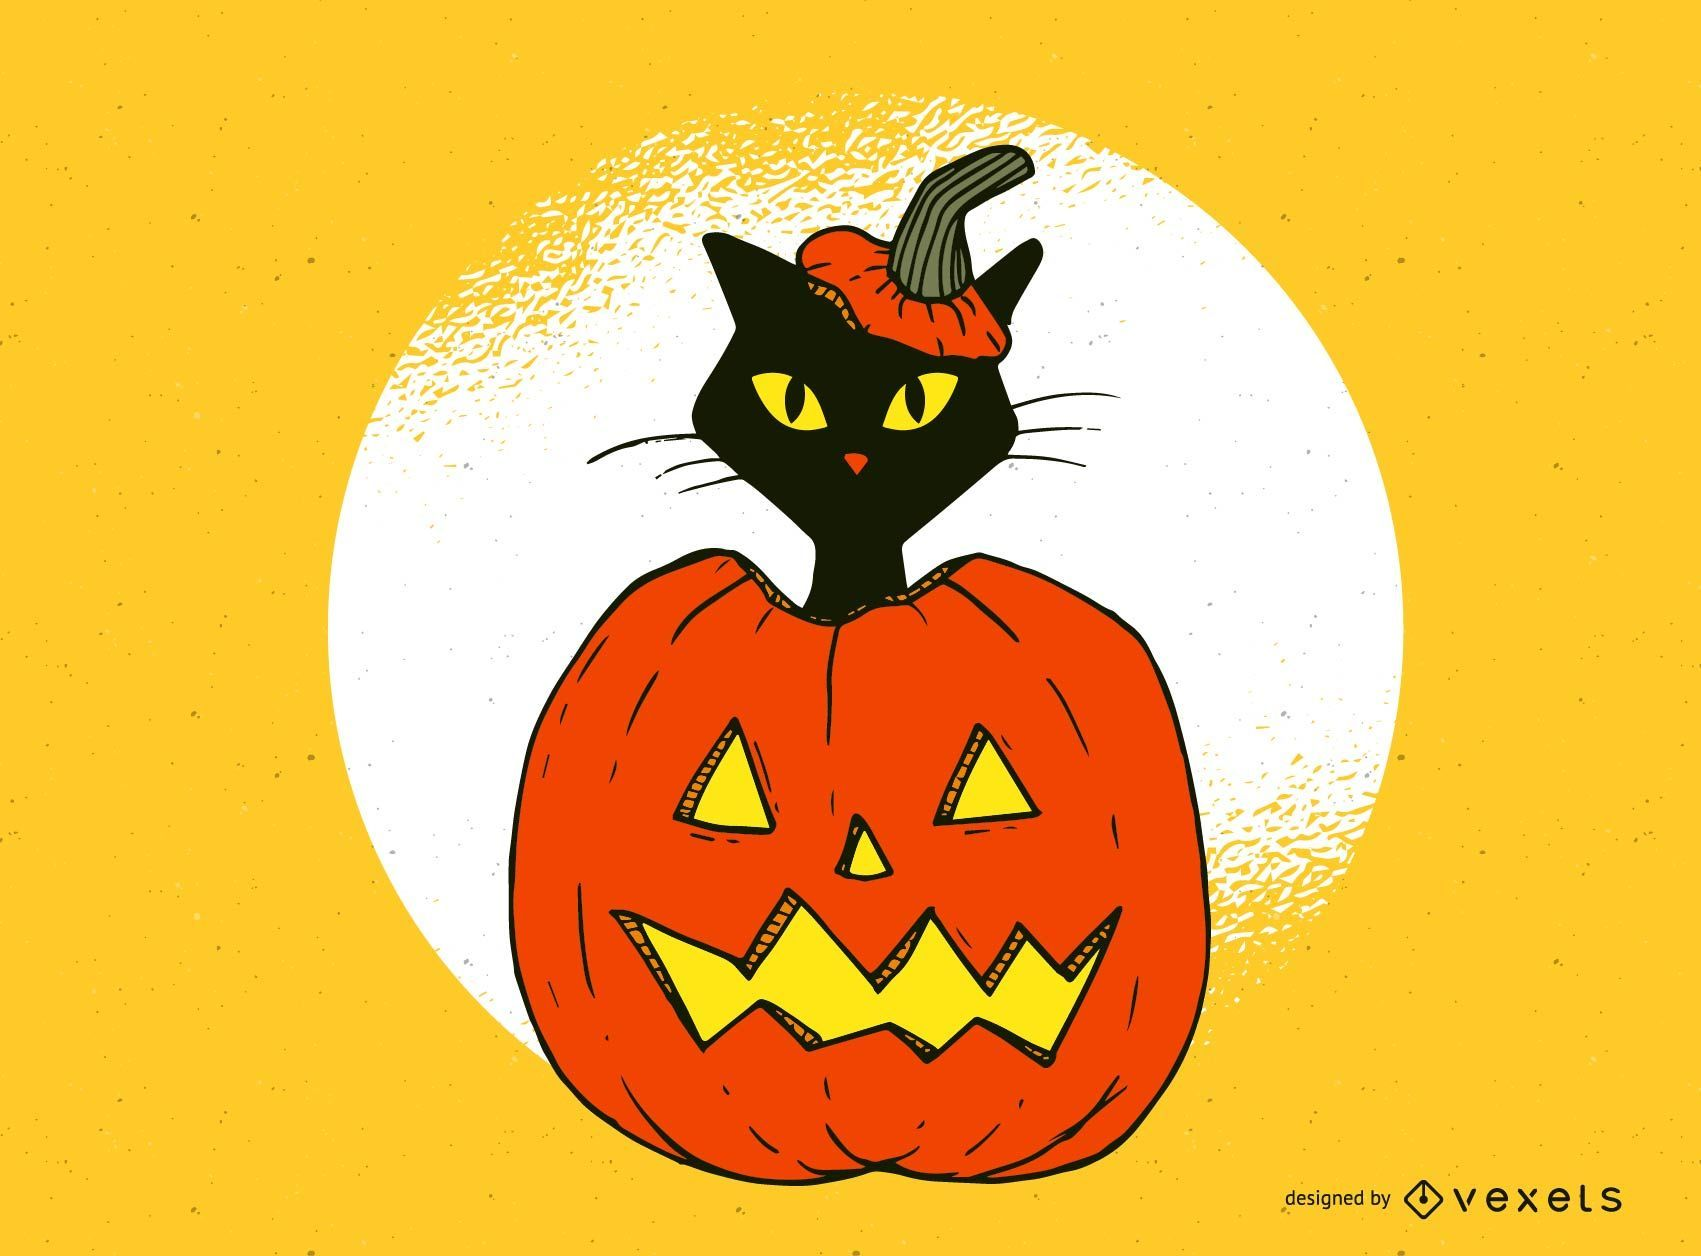 Cat in jack-o-lantern design